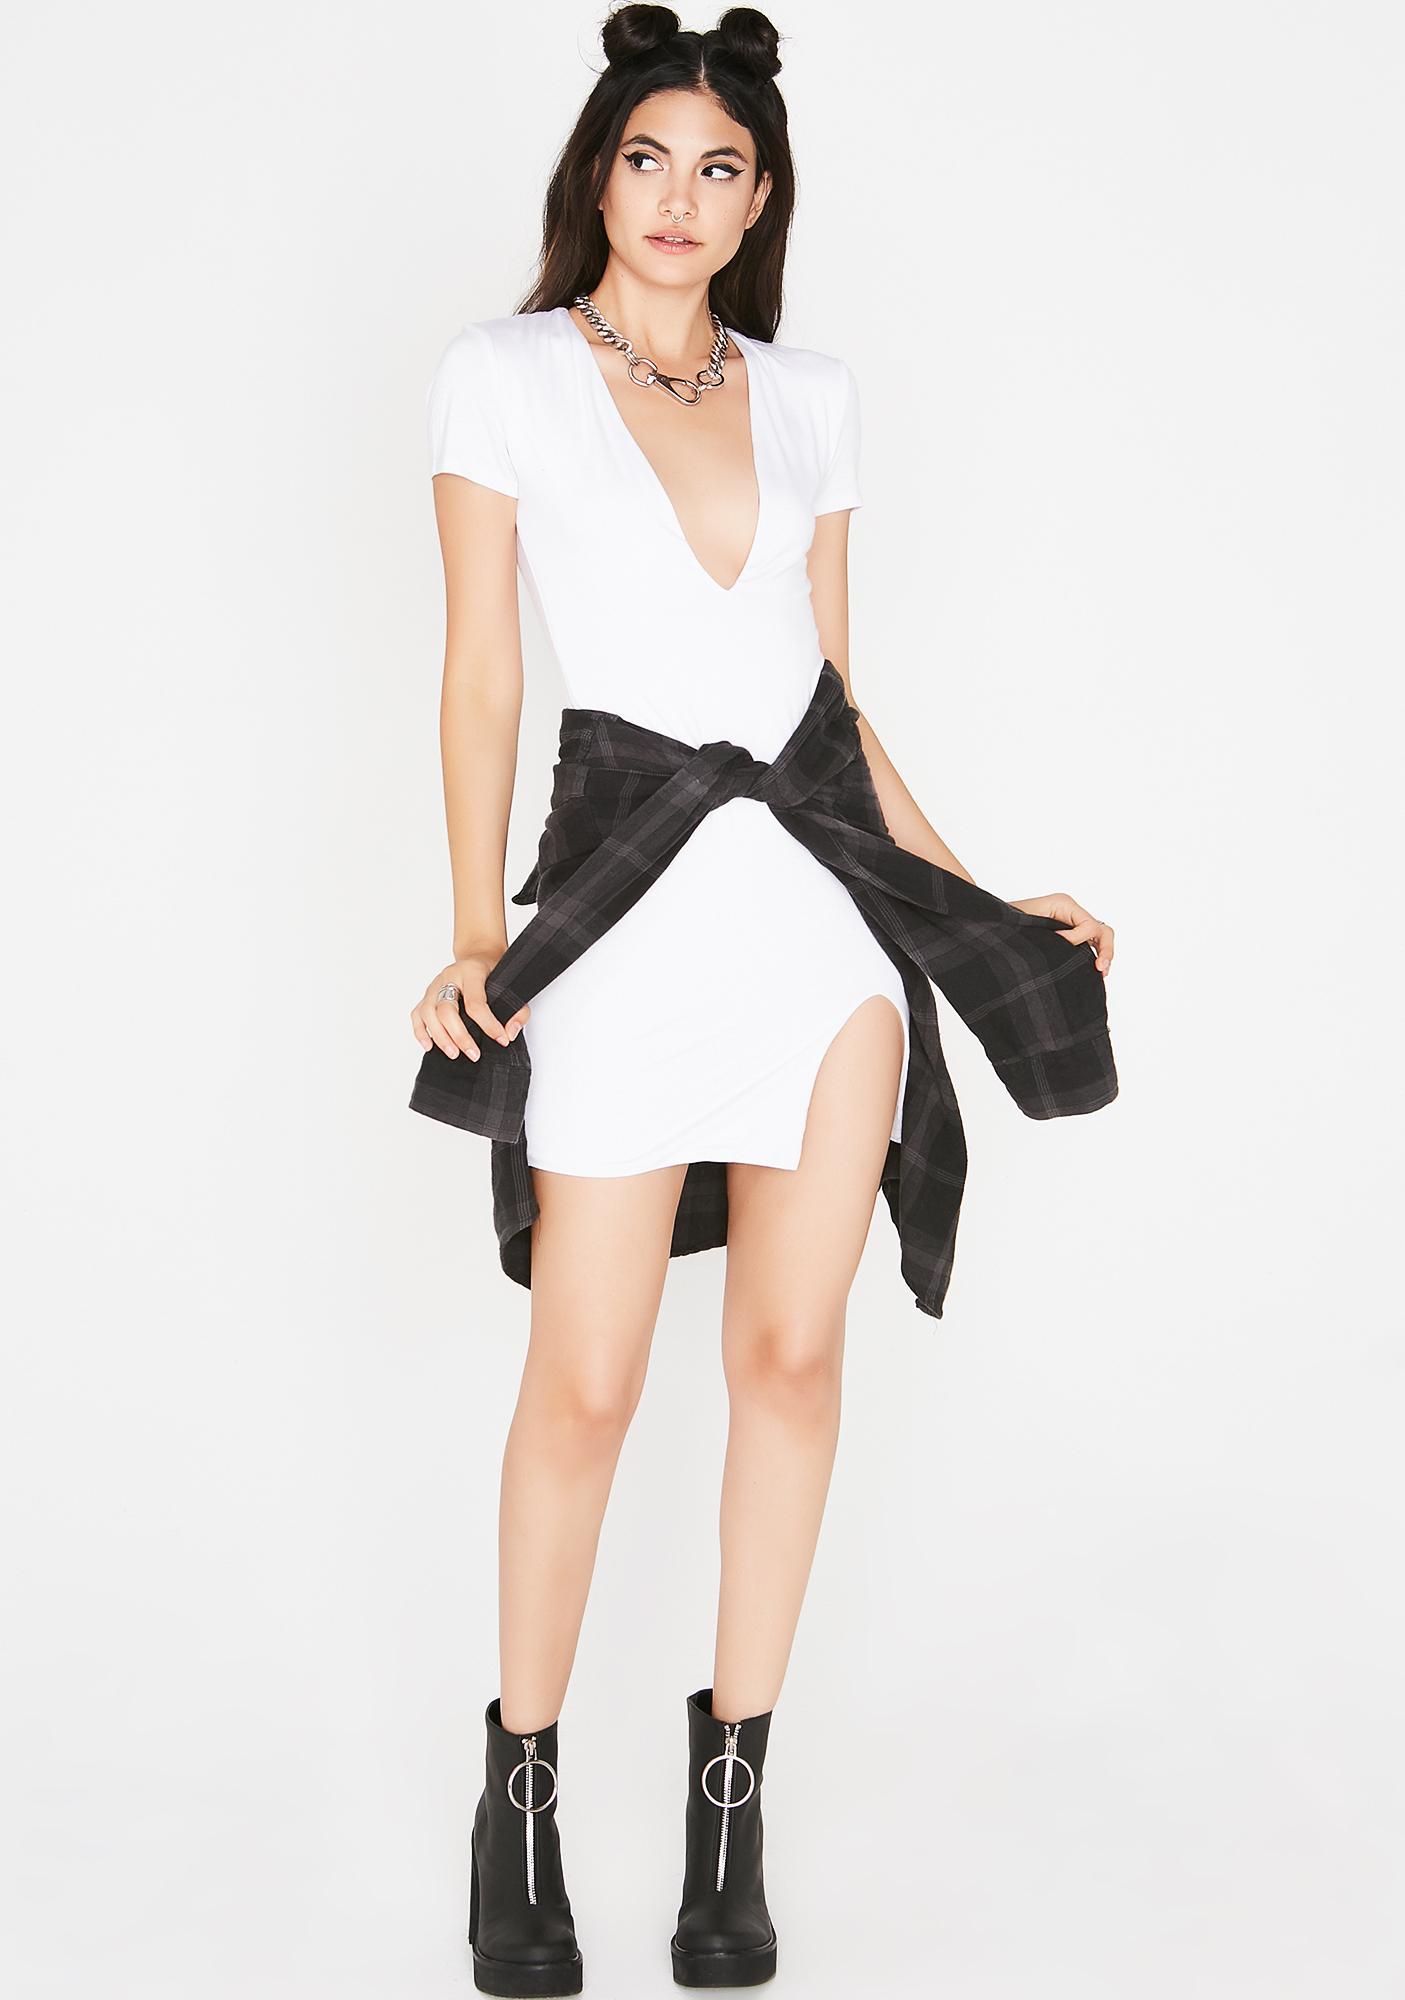 Arm Candy Mini Dress